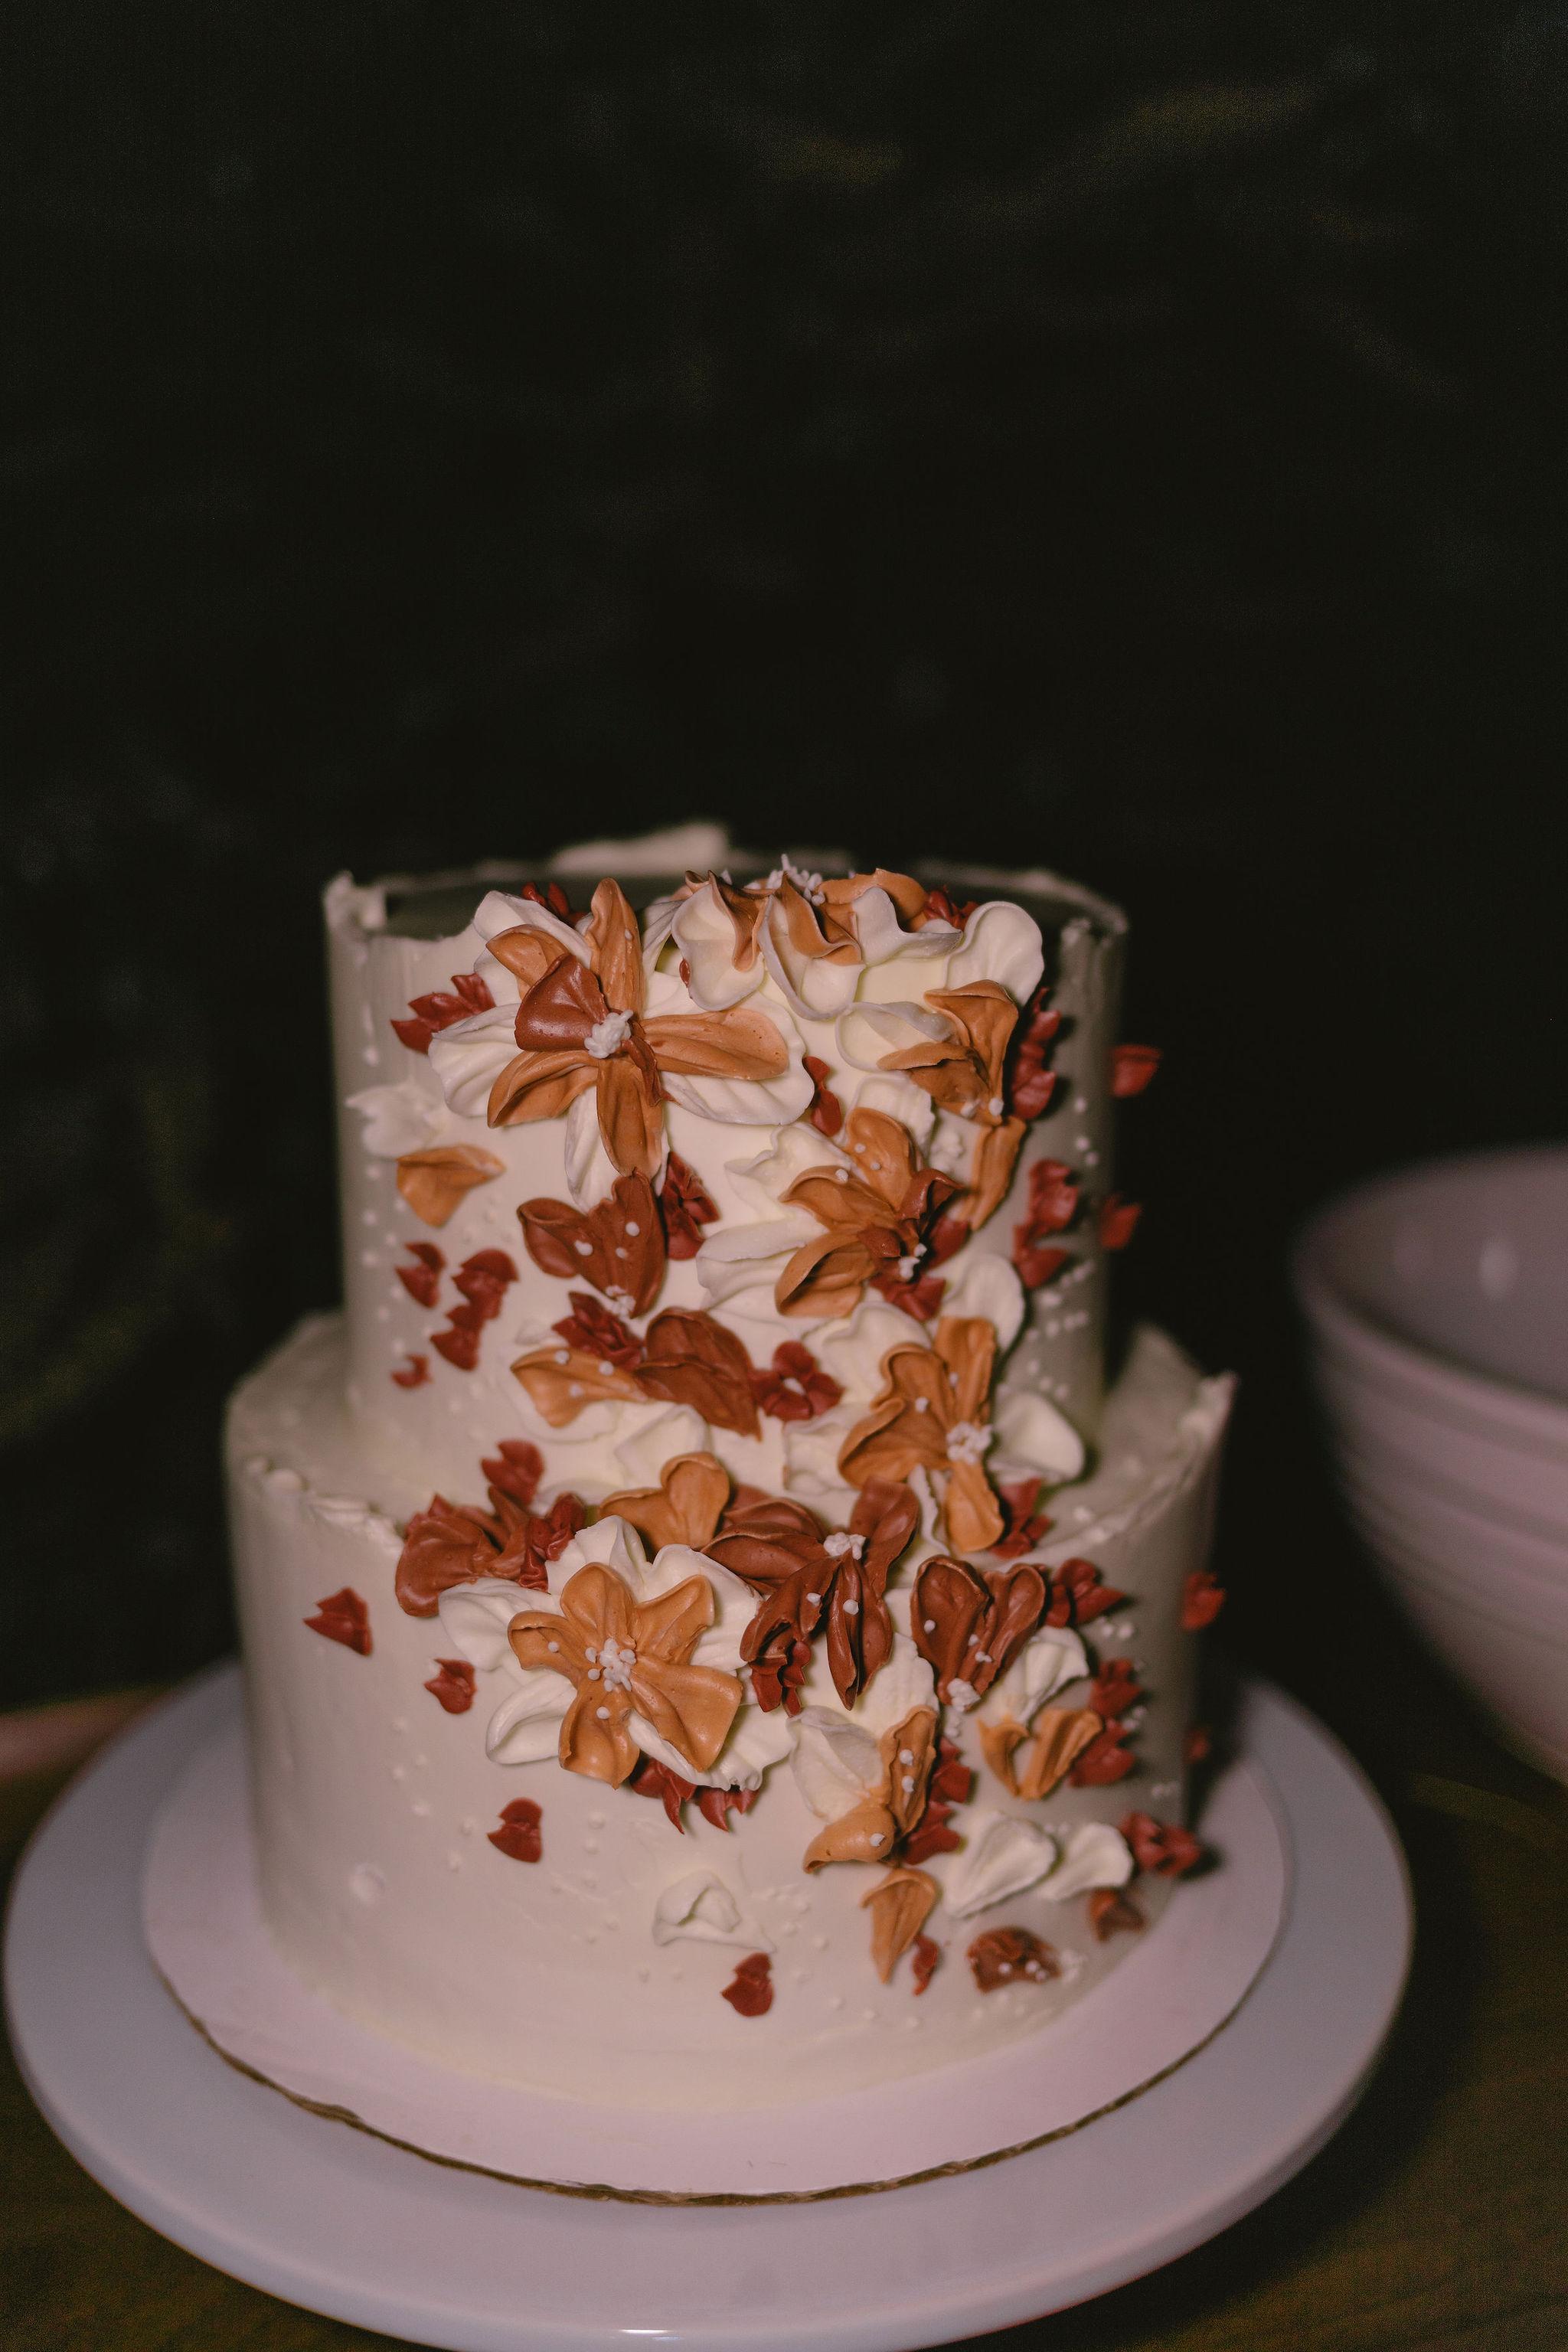 Maile Cake Design Floral Frosted Wedding Cake Princess Kaiulani Tabernero 1